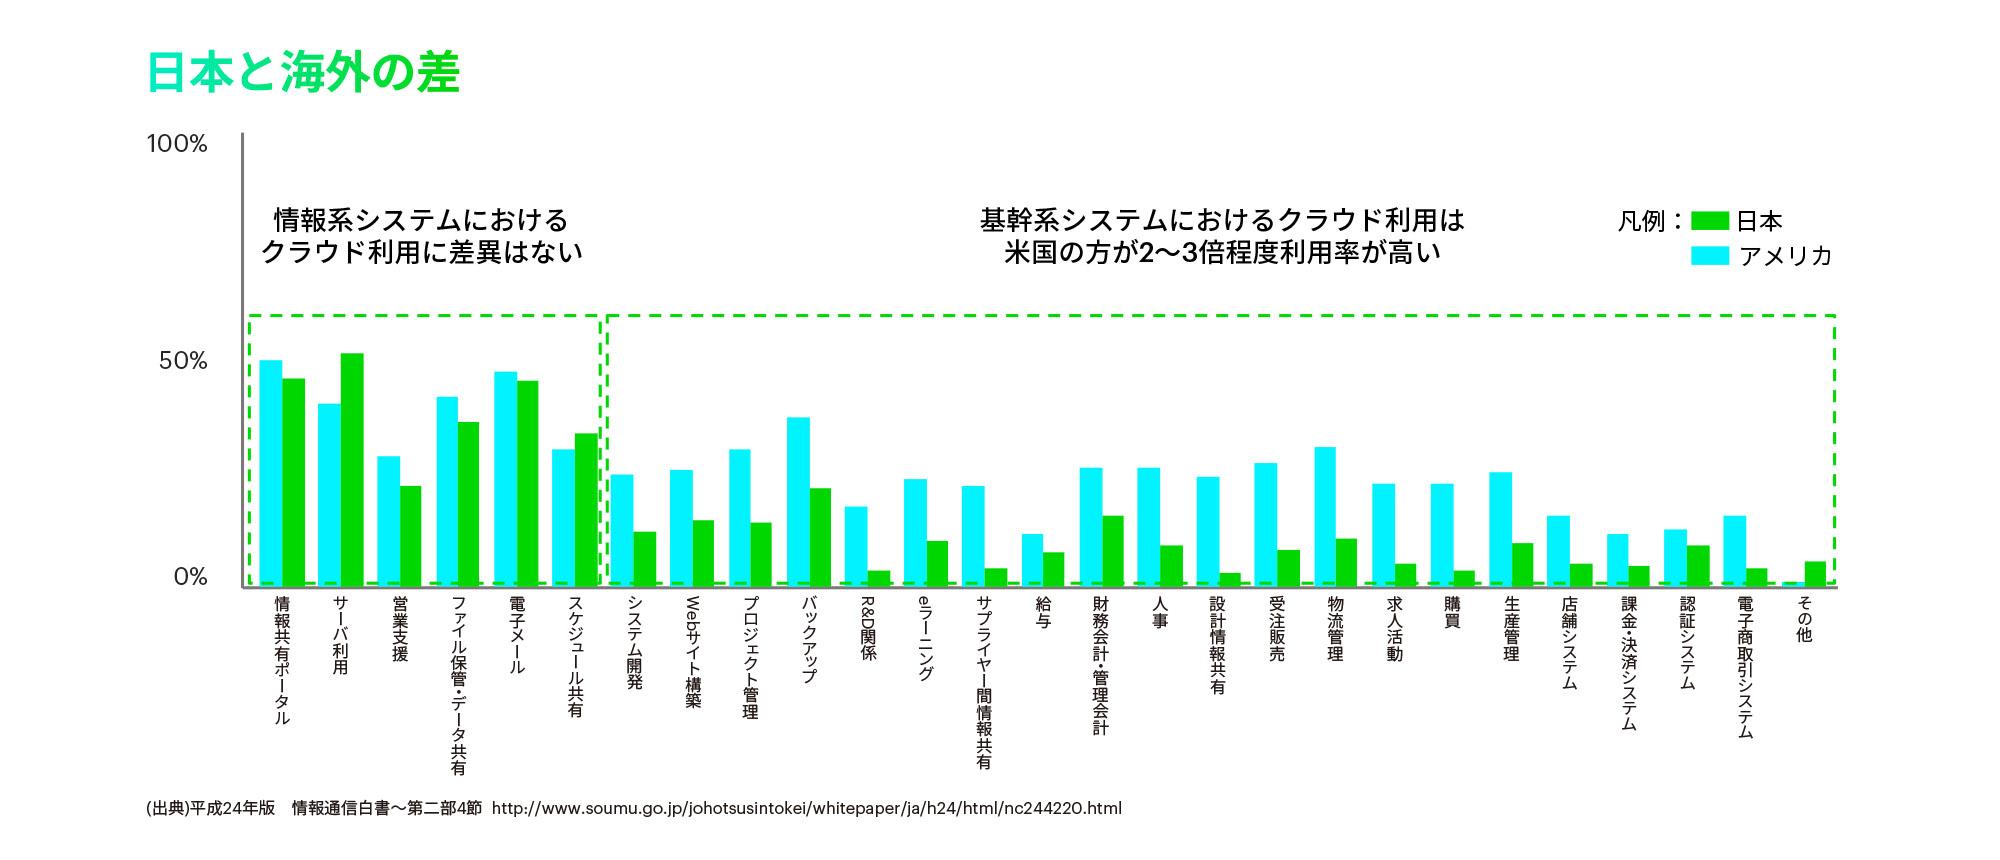 https://www.accenture.com/t00010101T000000Z__w__/jp-ja/_acnmedia/Accenture/Conversion-Assets/DotCom/Images/Local/ja-jp/5/Accenture-17-010764-Modernization-2Image2.jpgla=ja-JP